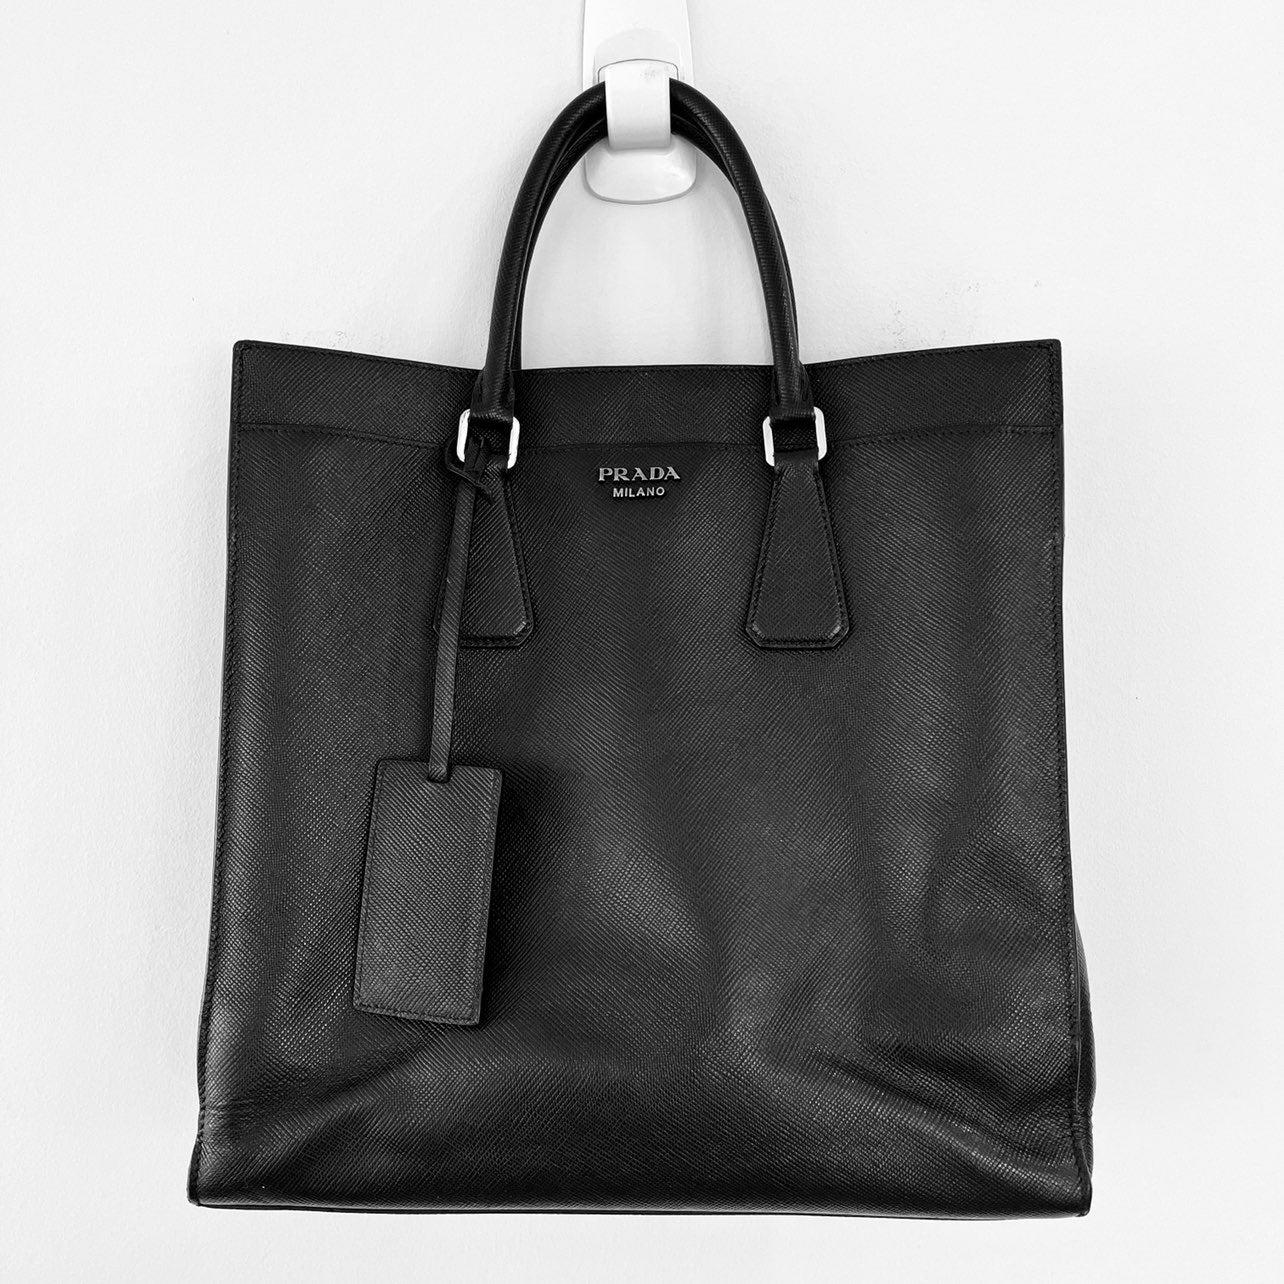 Prada Tote Bag / Purse